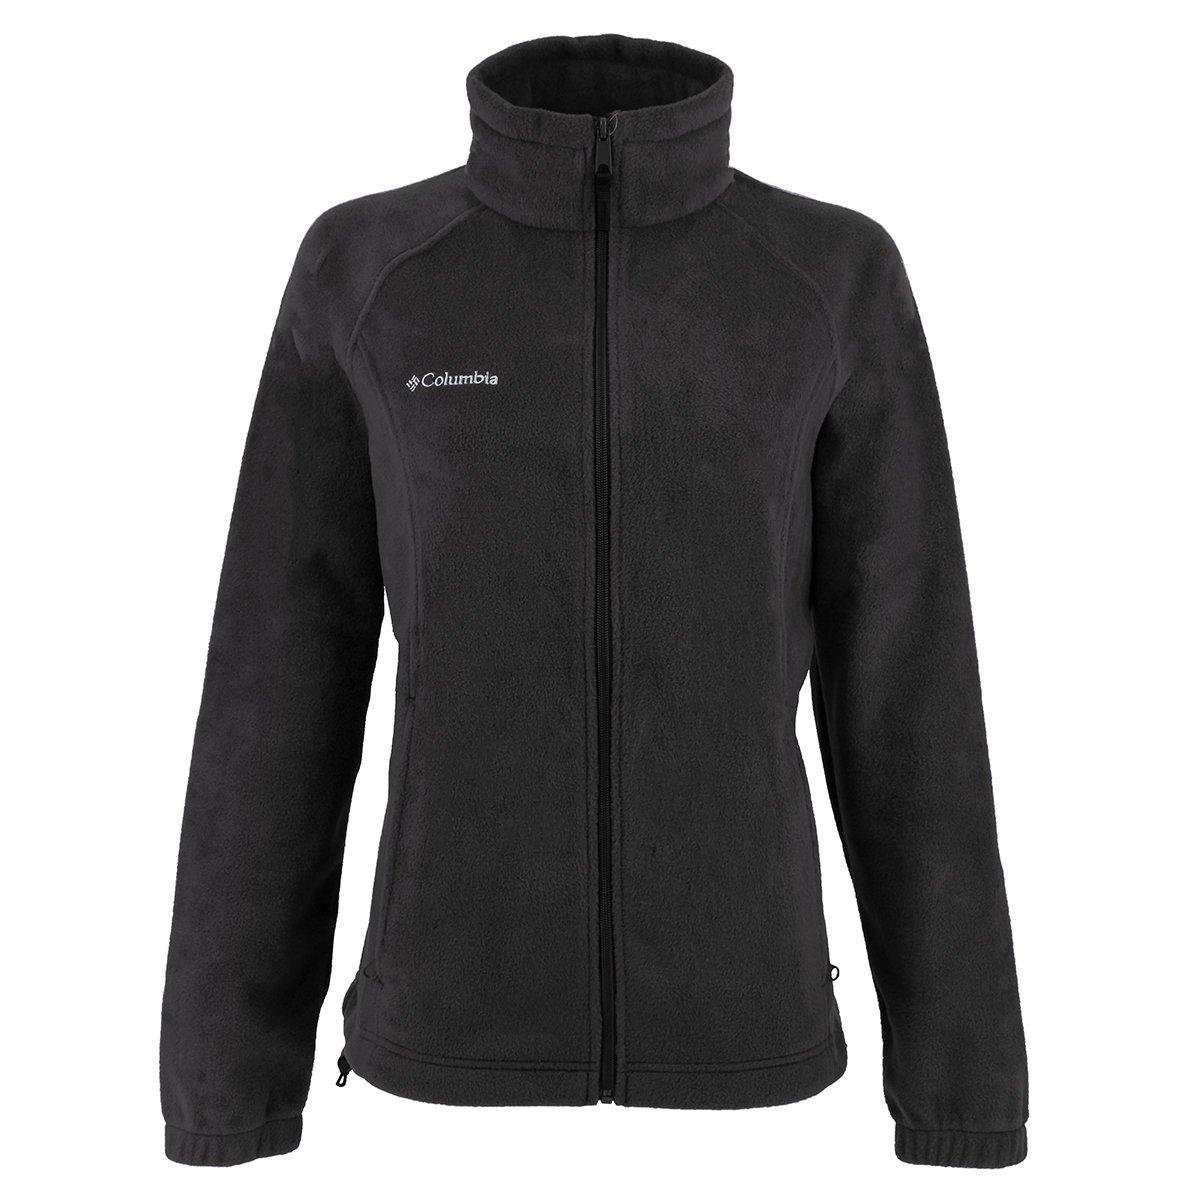 cbfc2ff60616ce Amazon.com  Columbia Women s Benton Springs Full Zip Fleece Jacket ...